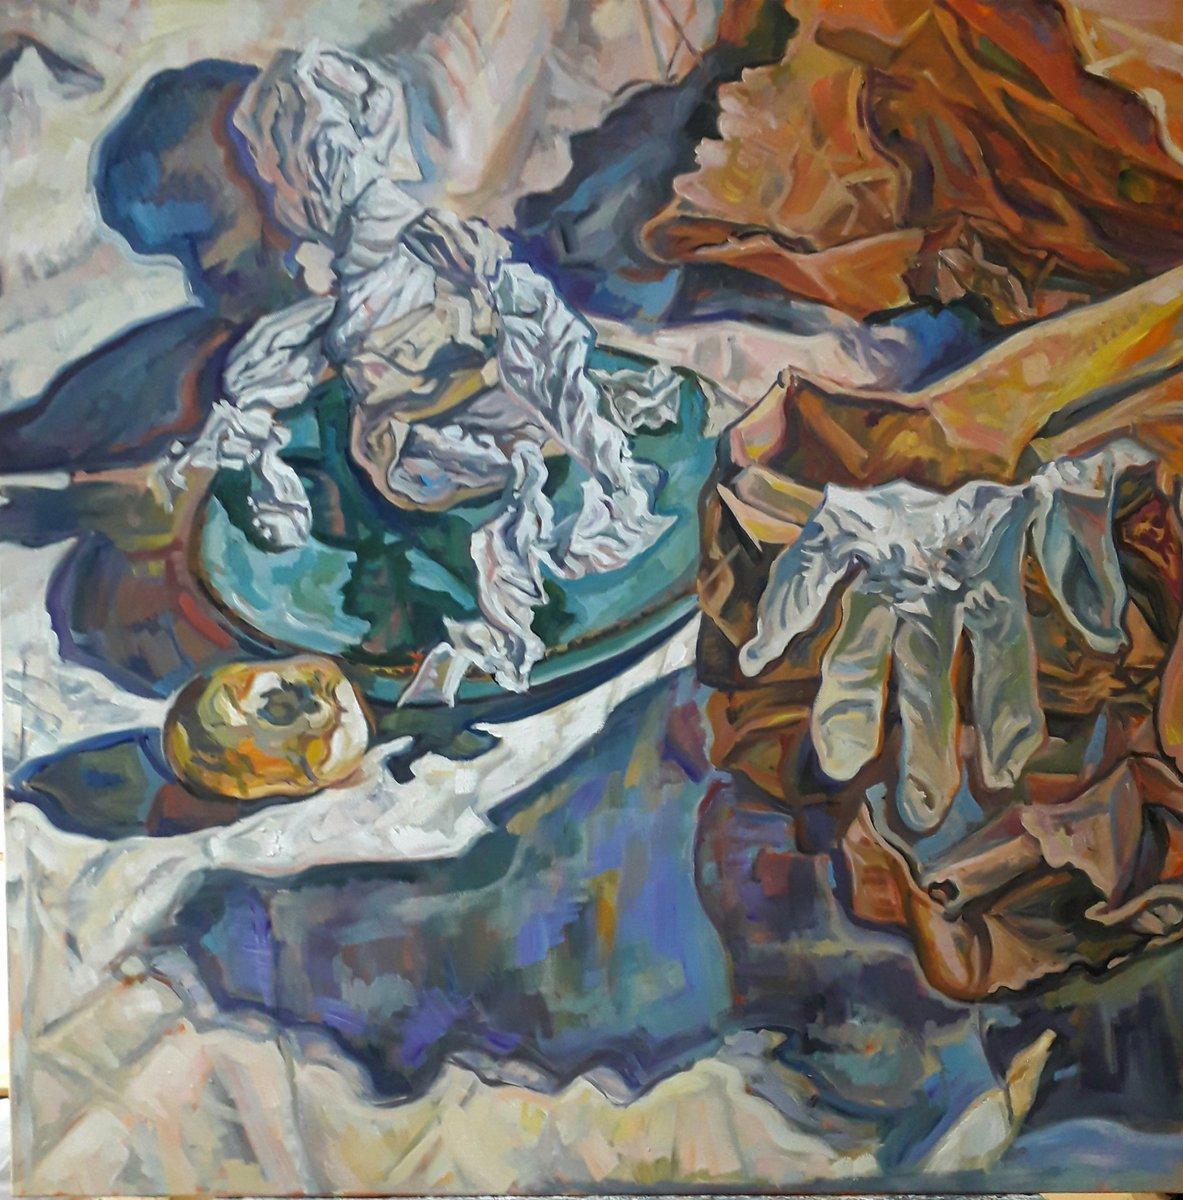 'Island' 80cm x 80cm 2021, Thin Tissue series #oiloncanvas #oilpainting #art #artist #womensart #isolation #Menopause #ArtistOnTwitter @rbsagallery #storytelling #stilllife https://t.co/0whF42ncT9